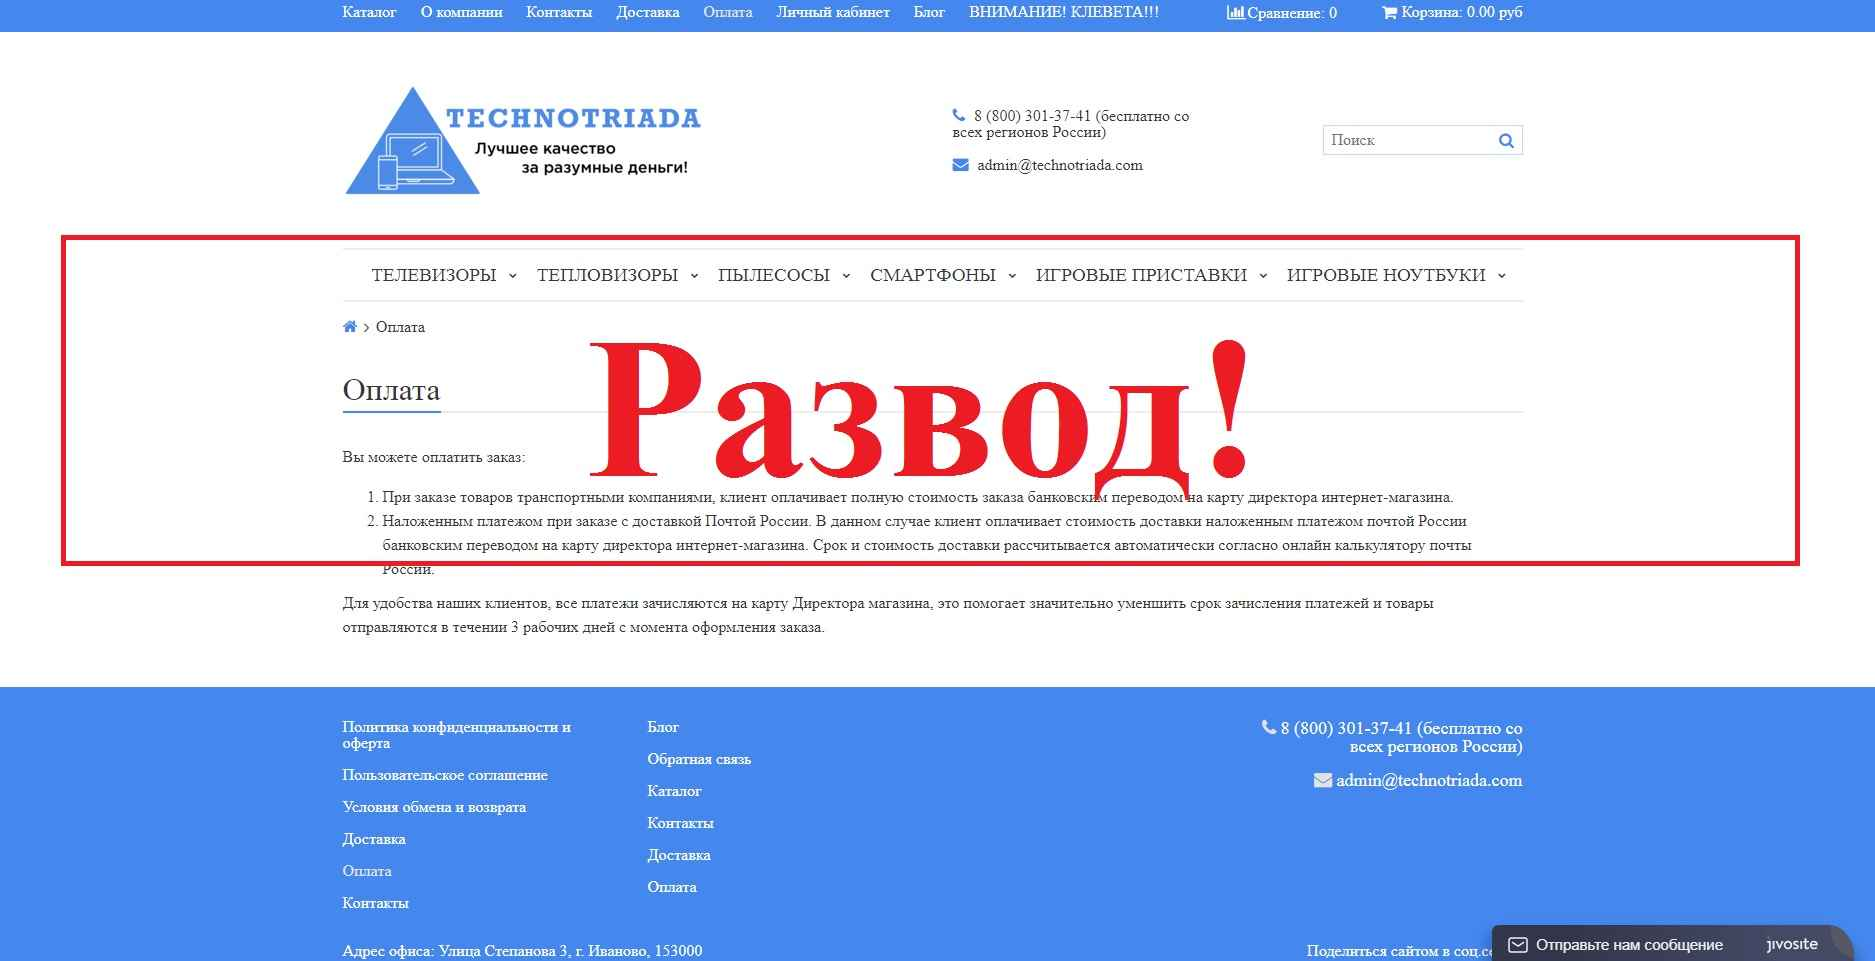 TechnoTriada – отзывы о магазине technotriada.com